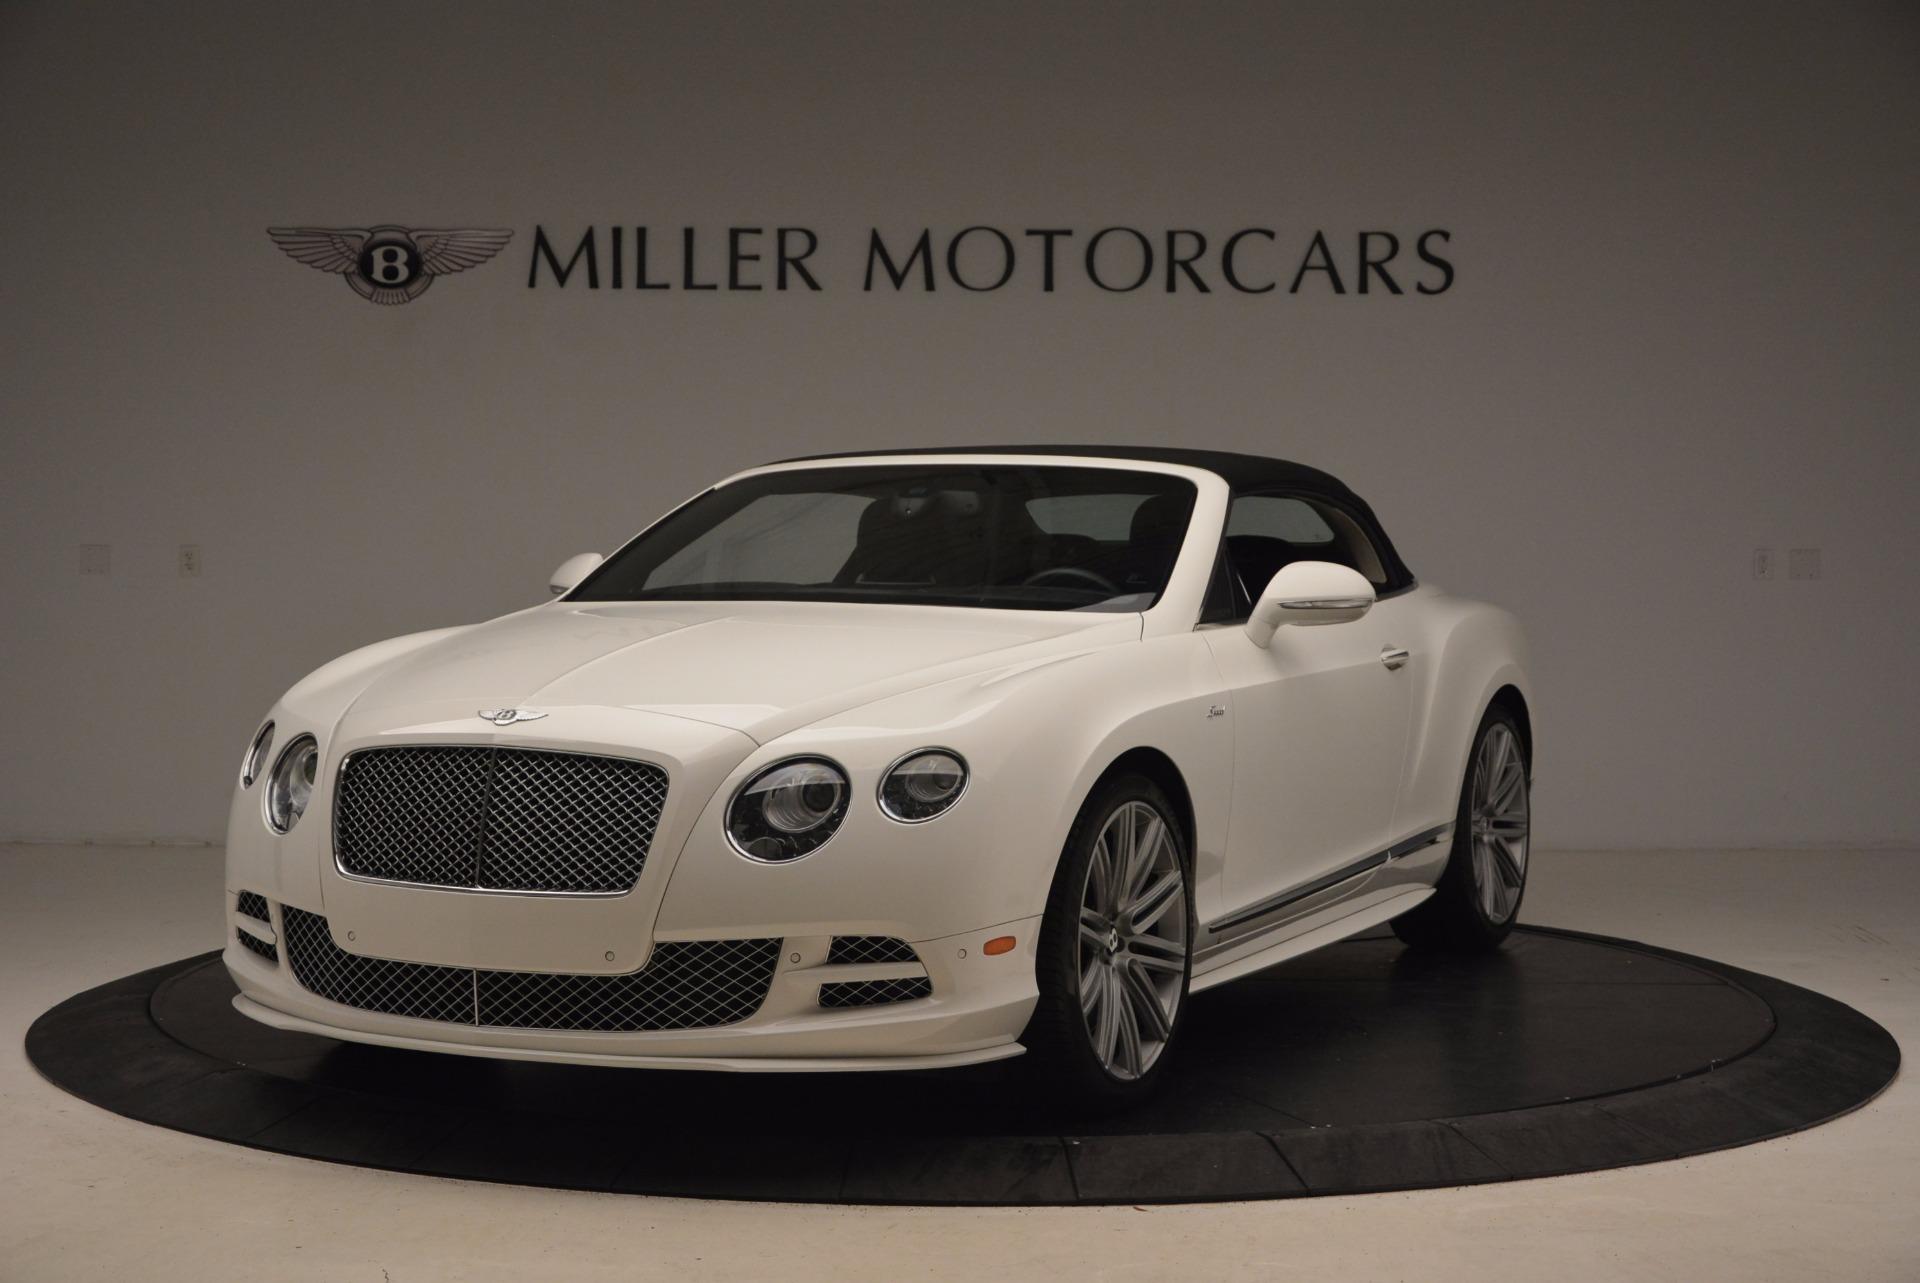 Used 2015 Bentley Continental GT Speed For Sale In Westport, CT 1714_p13